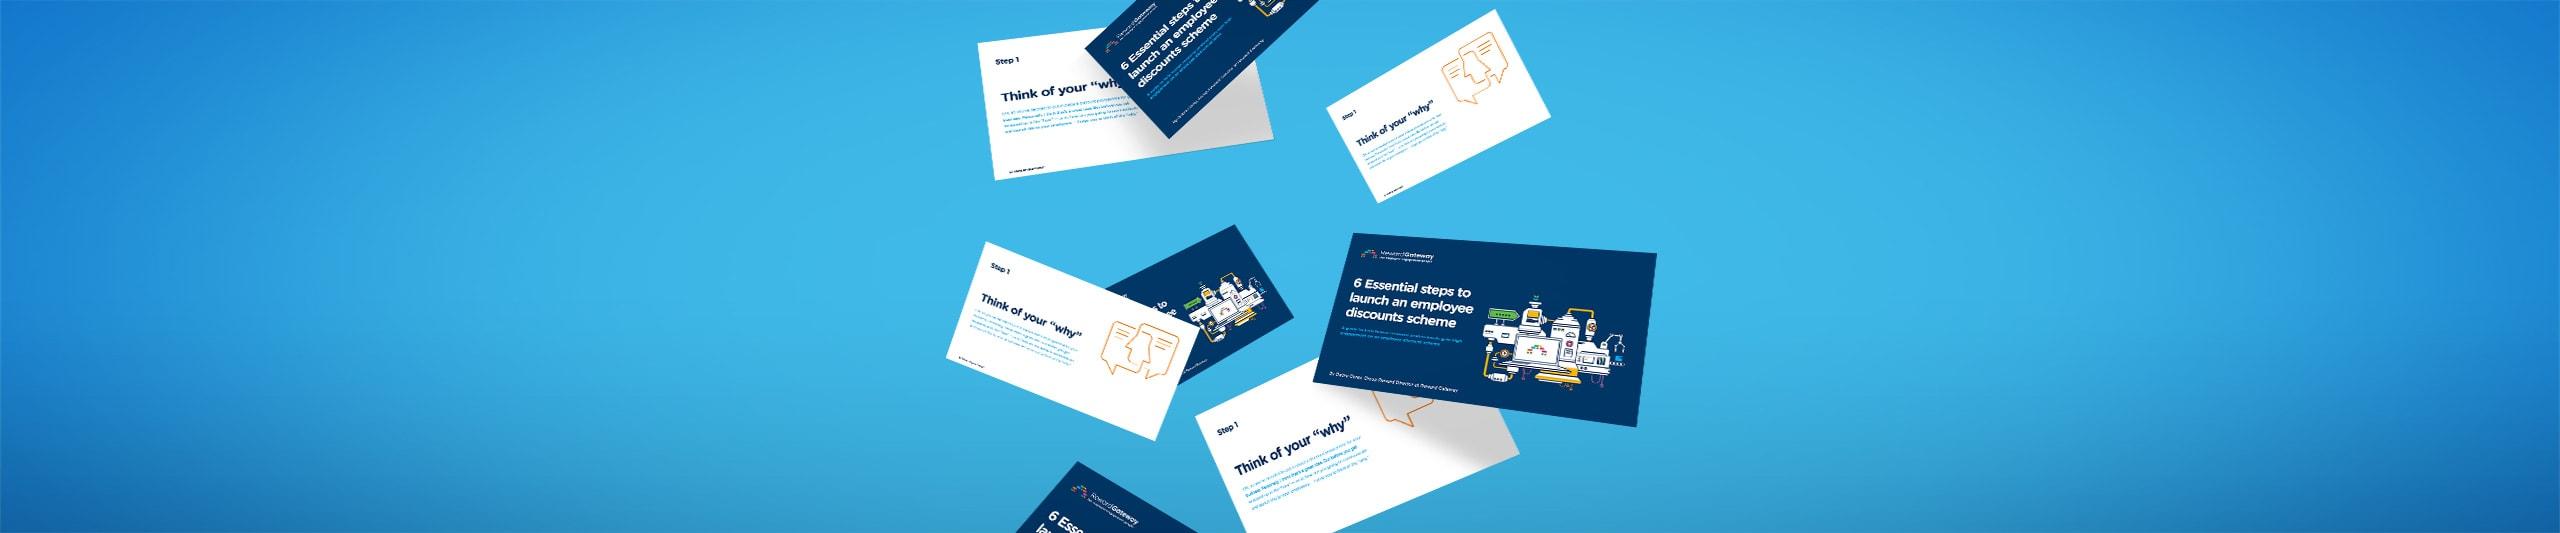 UK_6_steps_discounts_launch_banner-min-min.jpg